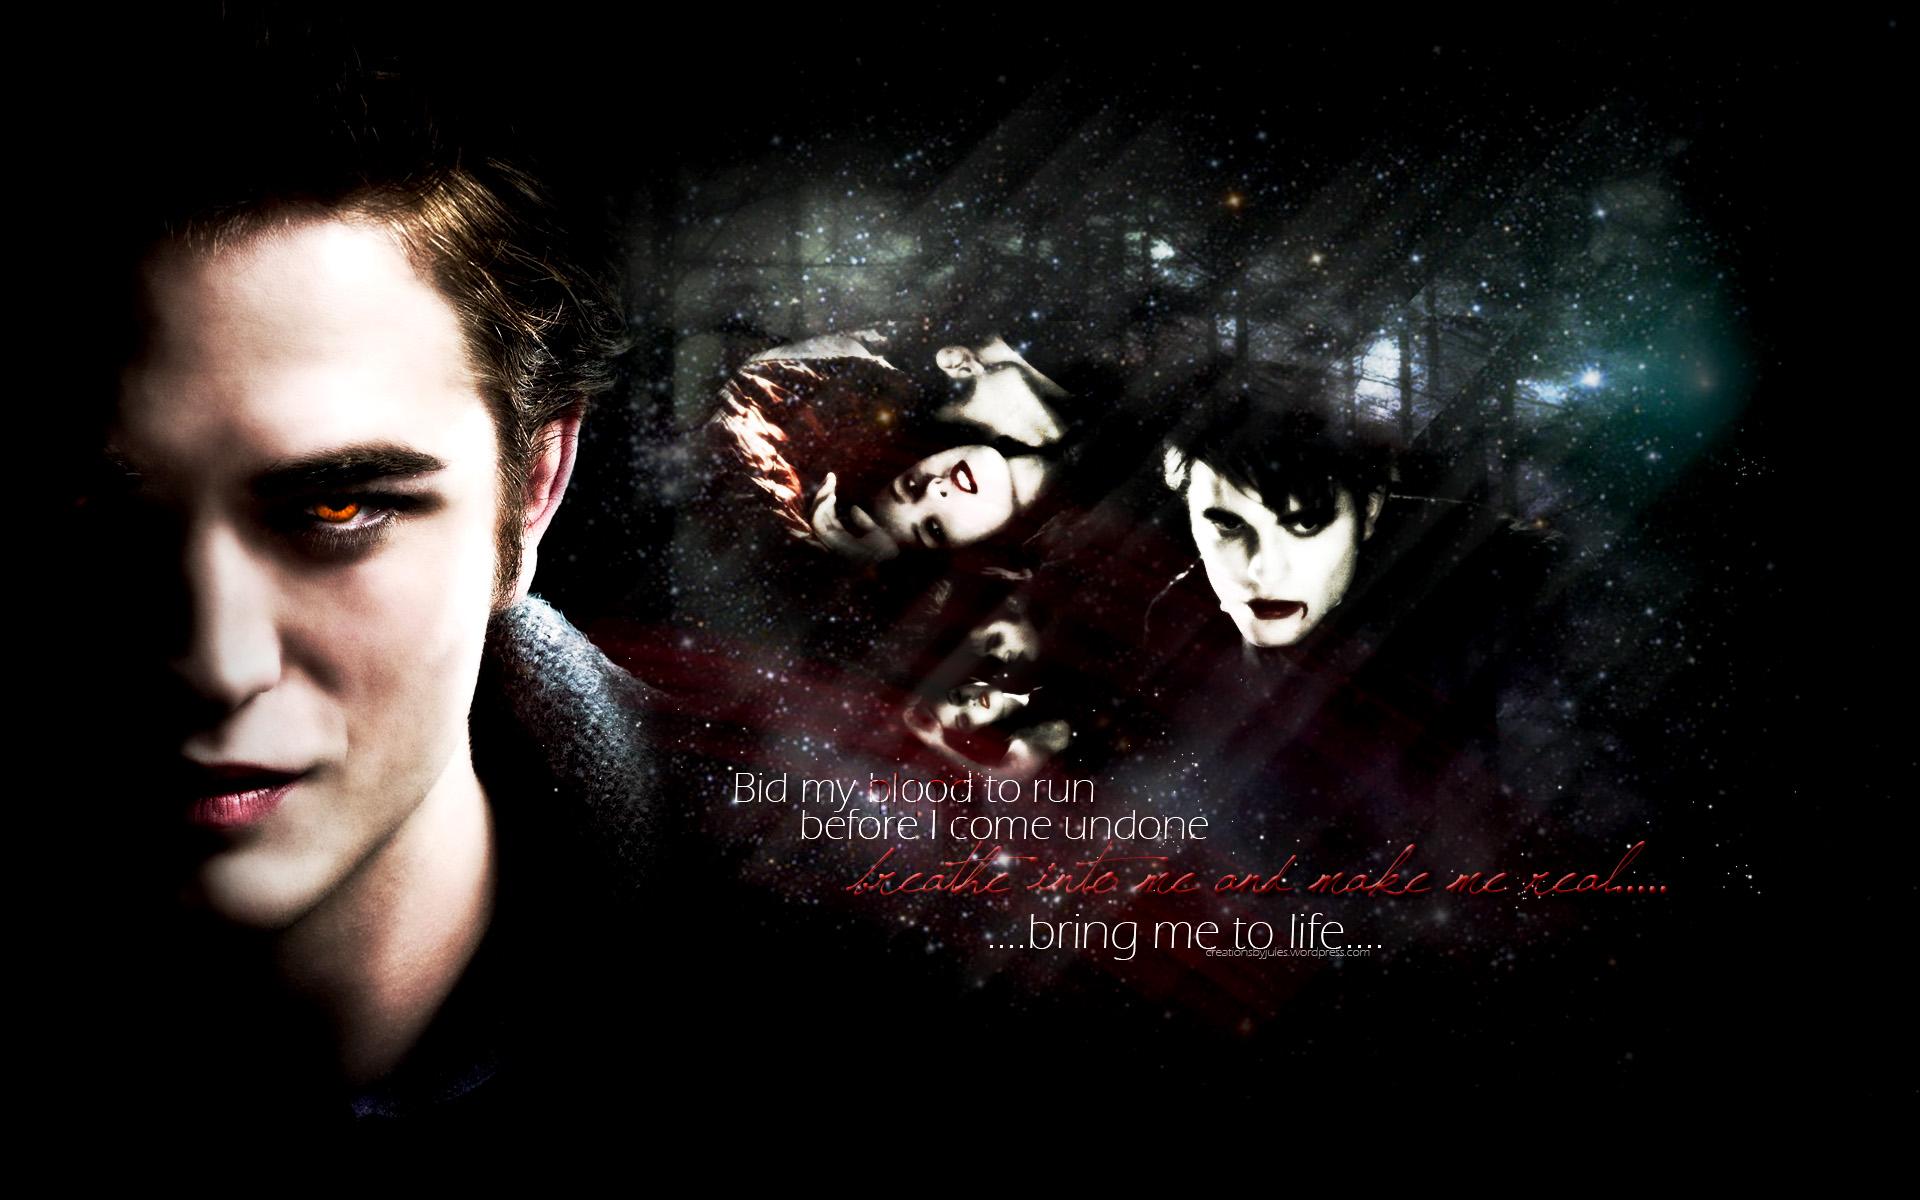 Edward Cullen Wallpaper Robert Pattinson Australia